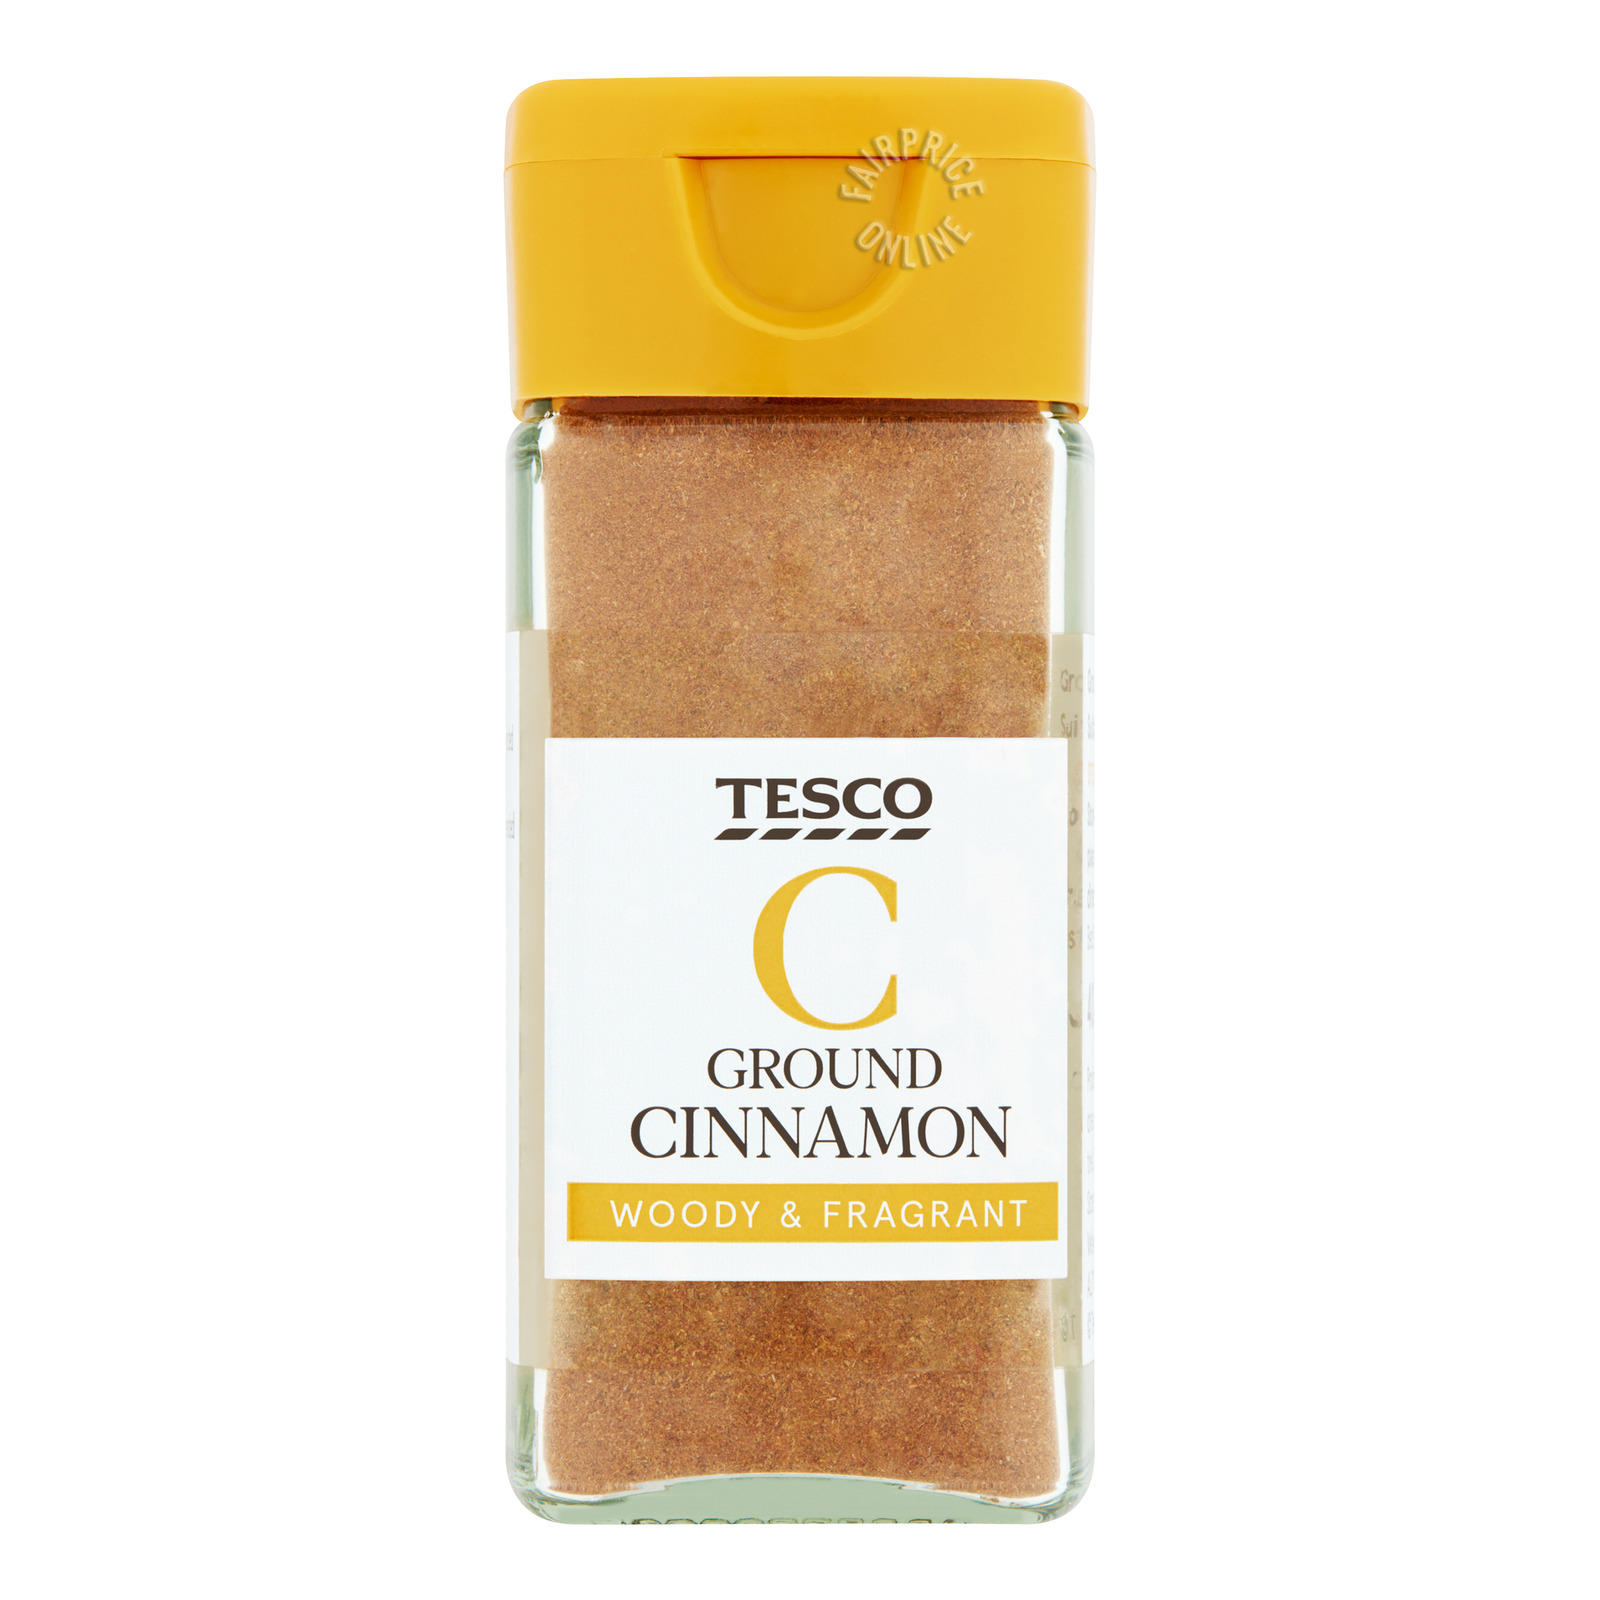 Tesco Ground Spice - Cinnamon